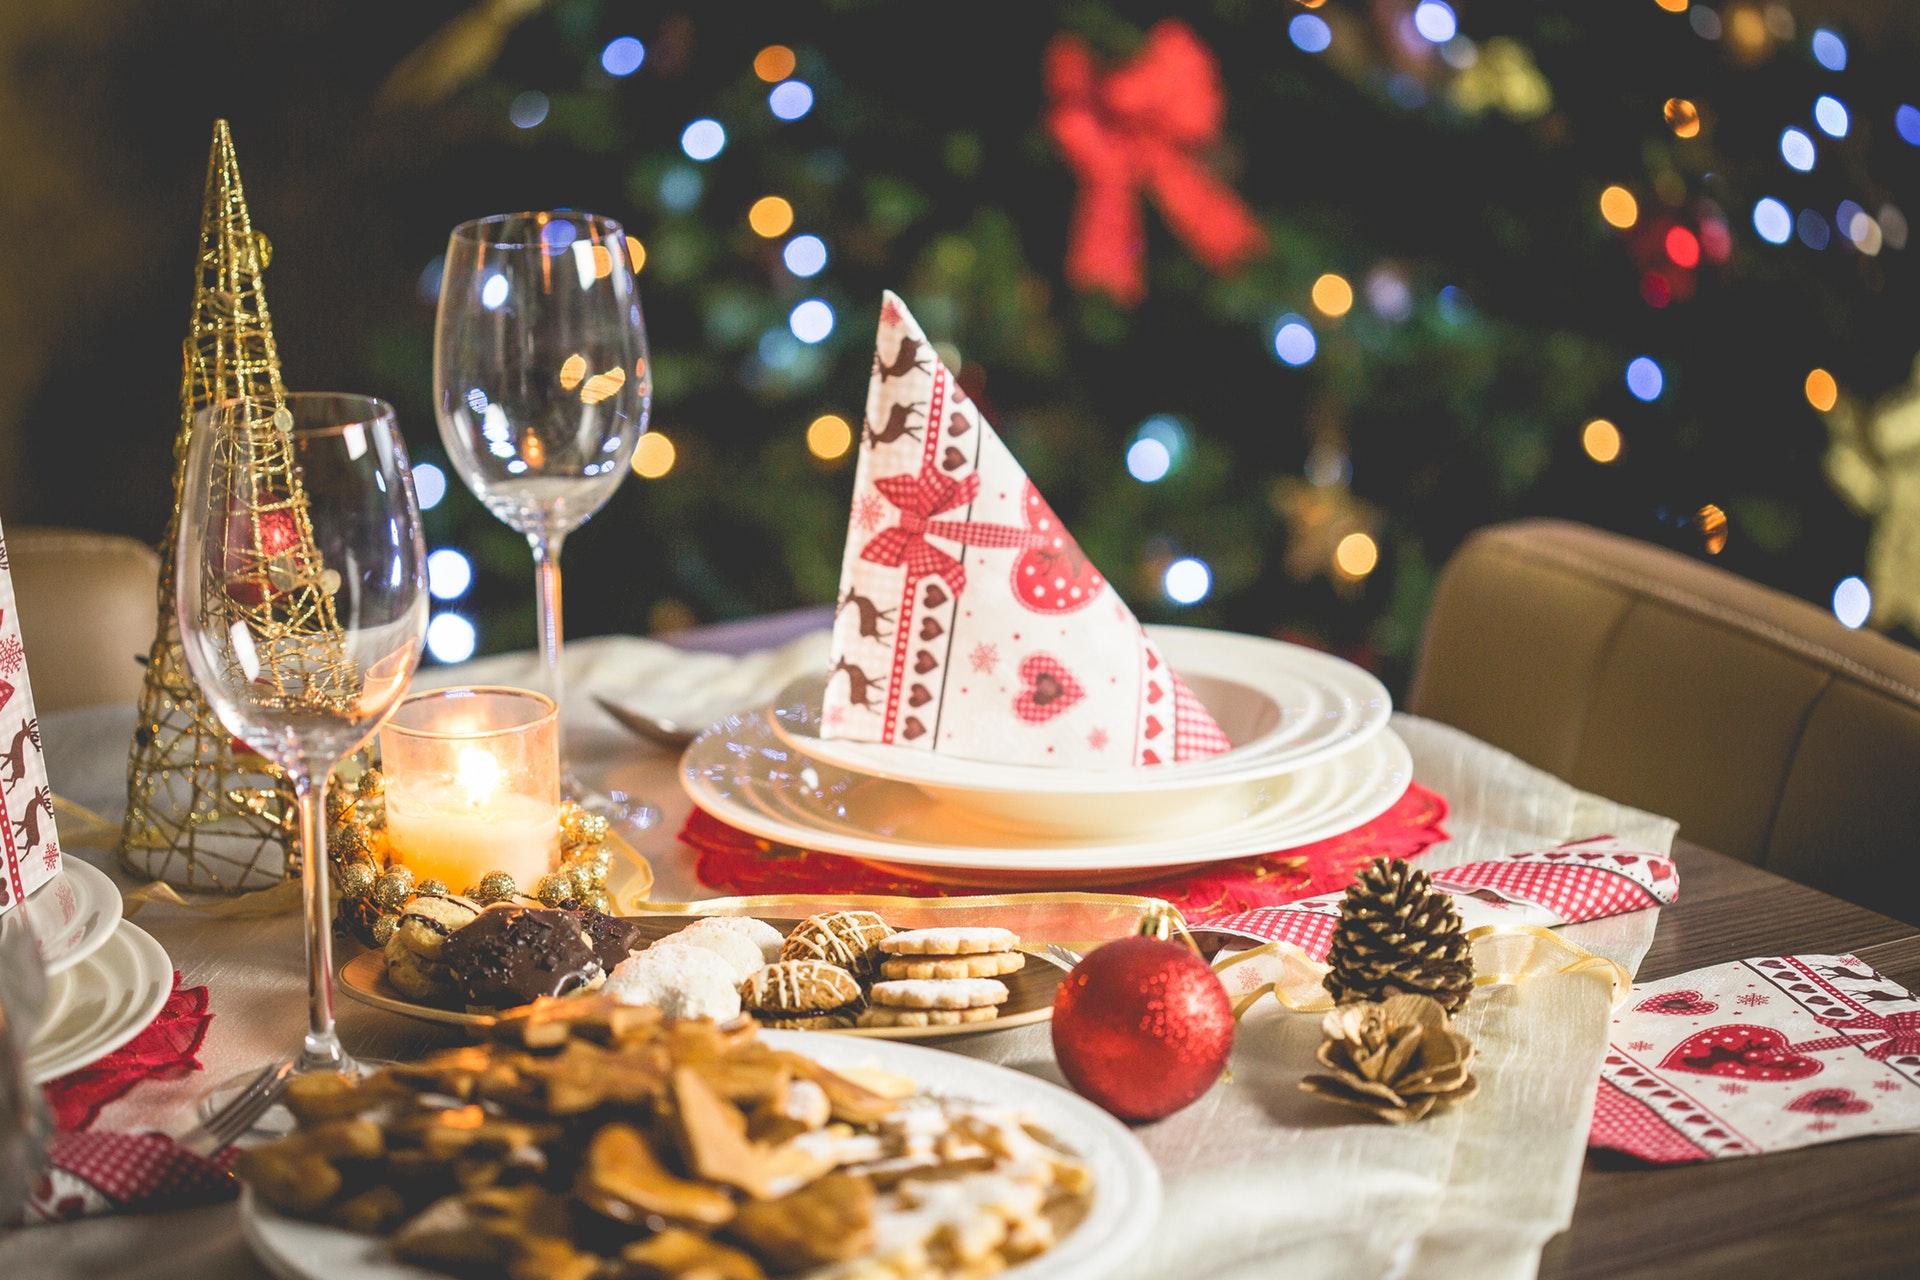 Holiday Dinner setting